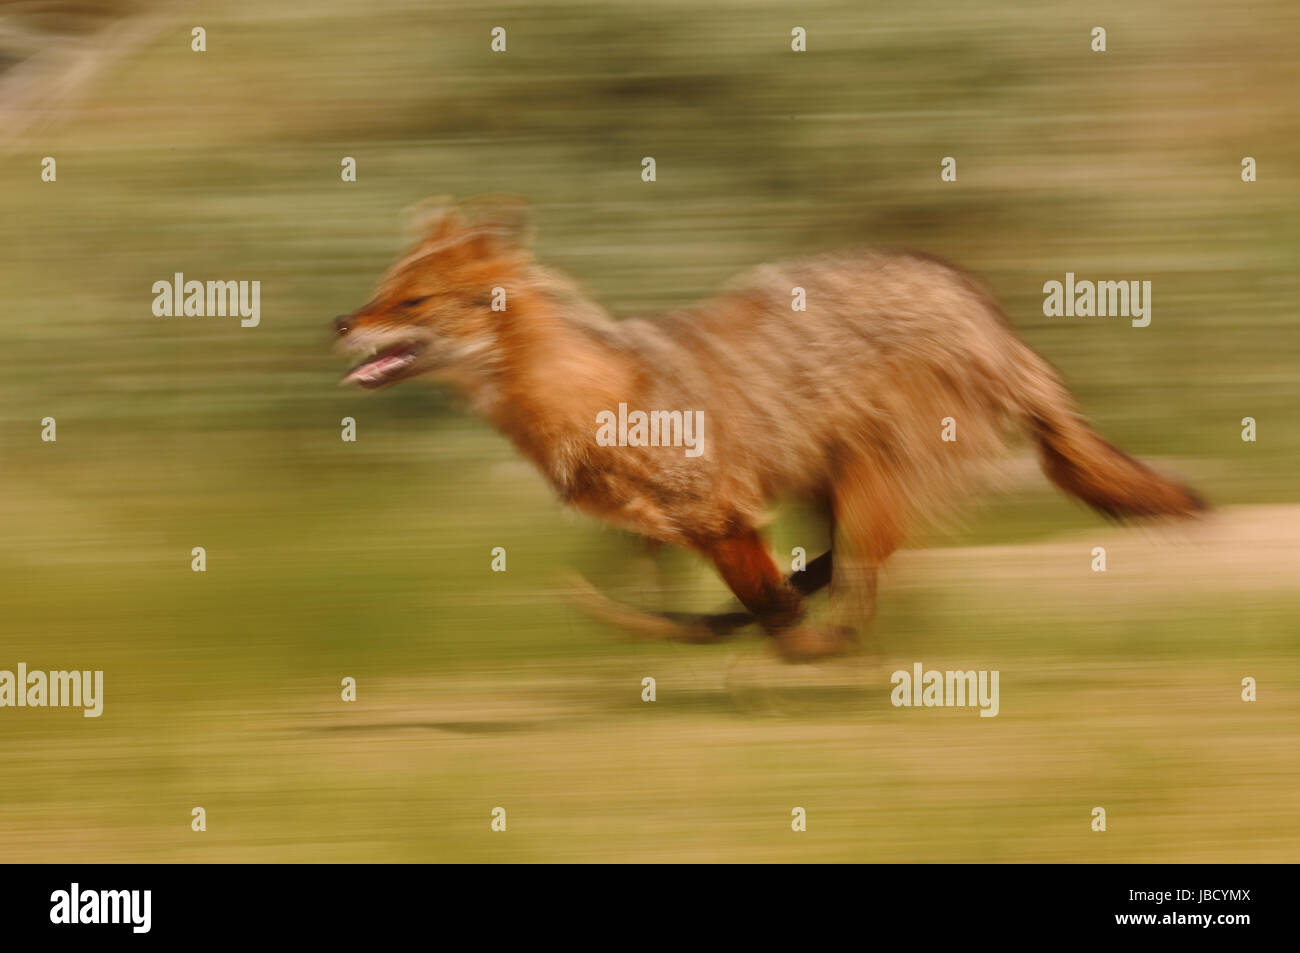 Golden Jackal or European Jackal (Canis aureus) artistic motion blur - Stock Image